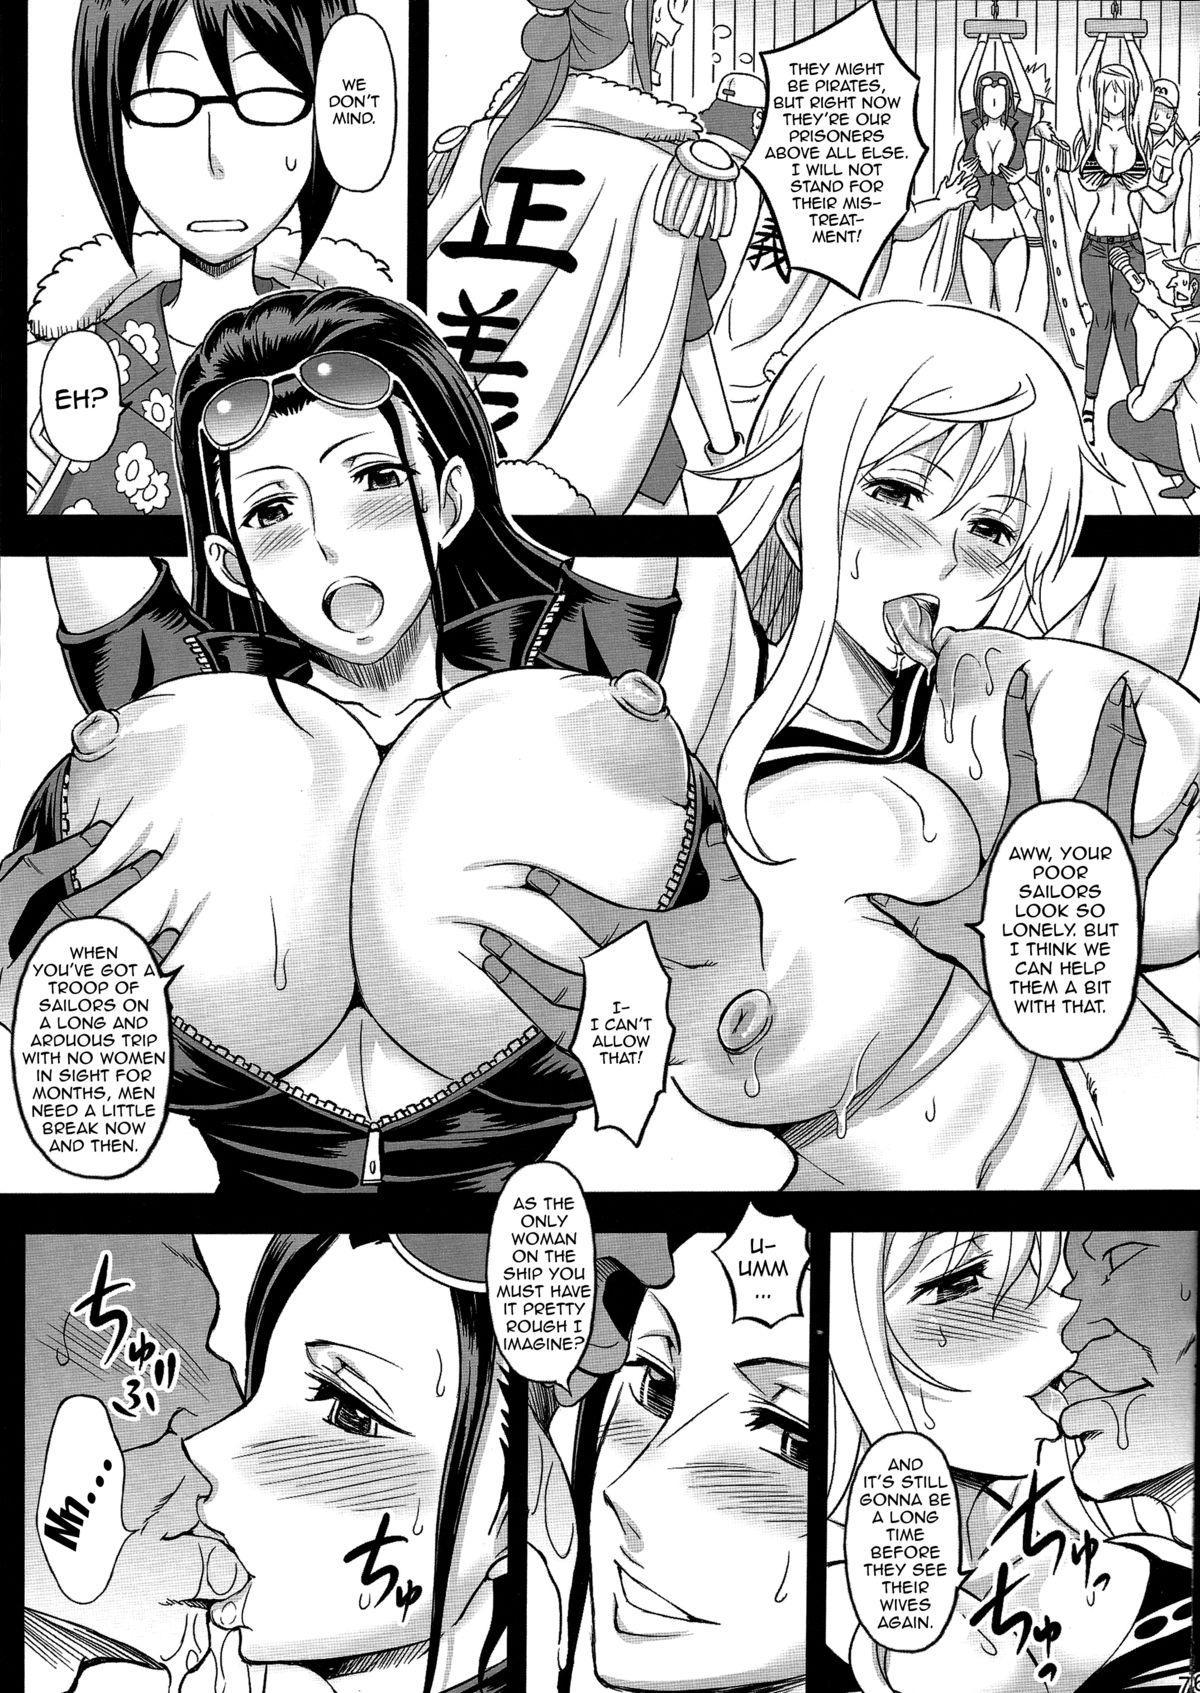 Rakuen Onna Kaizoku 3 - Woman Pirate in Paradise 5